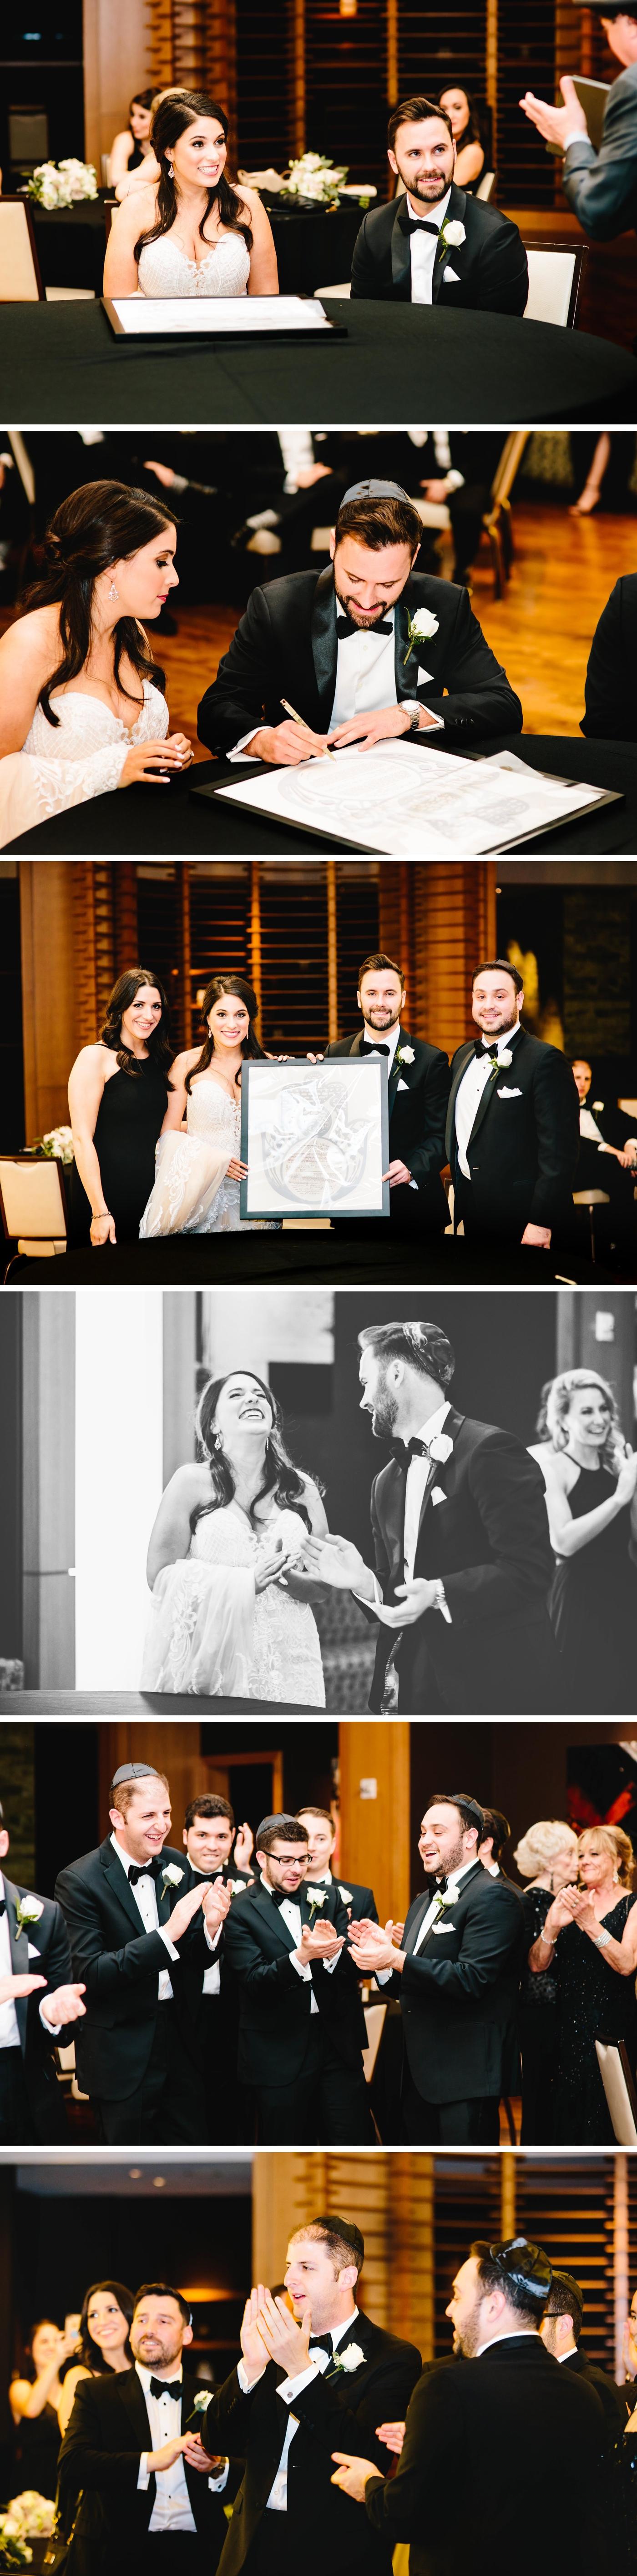 chicago-fine-art-wedding-photography-douglas35